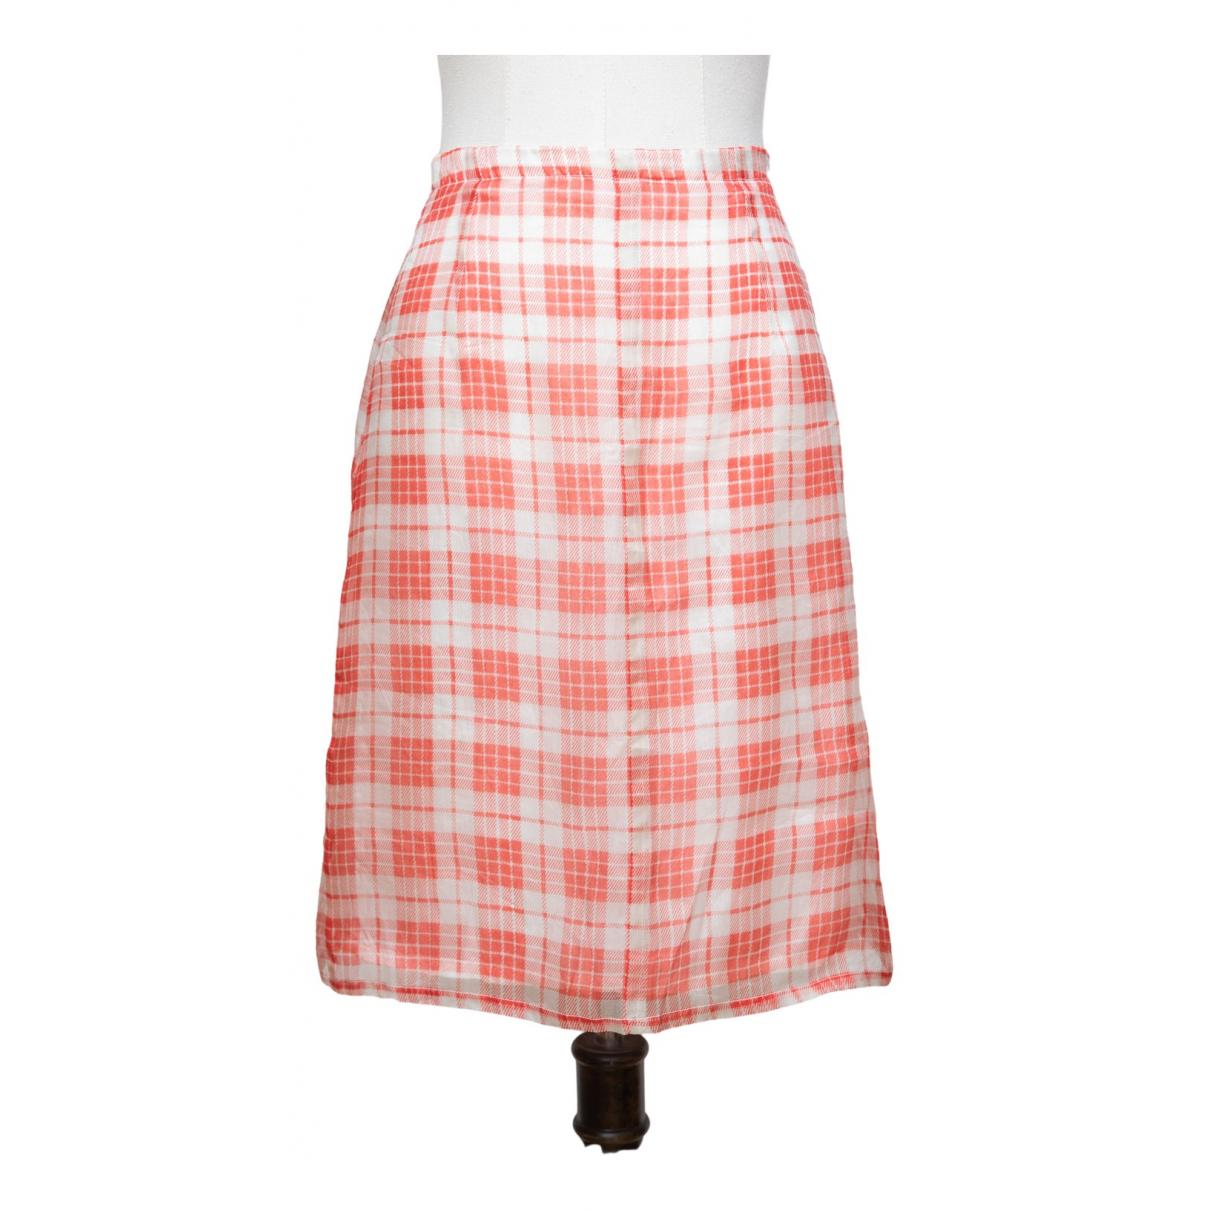 Dries Van Noten \N Orange Silk skirt for Women 36 FR